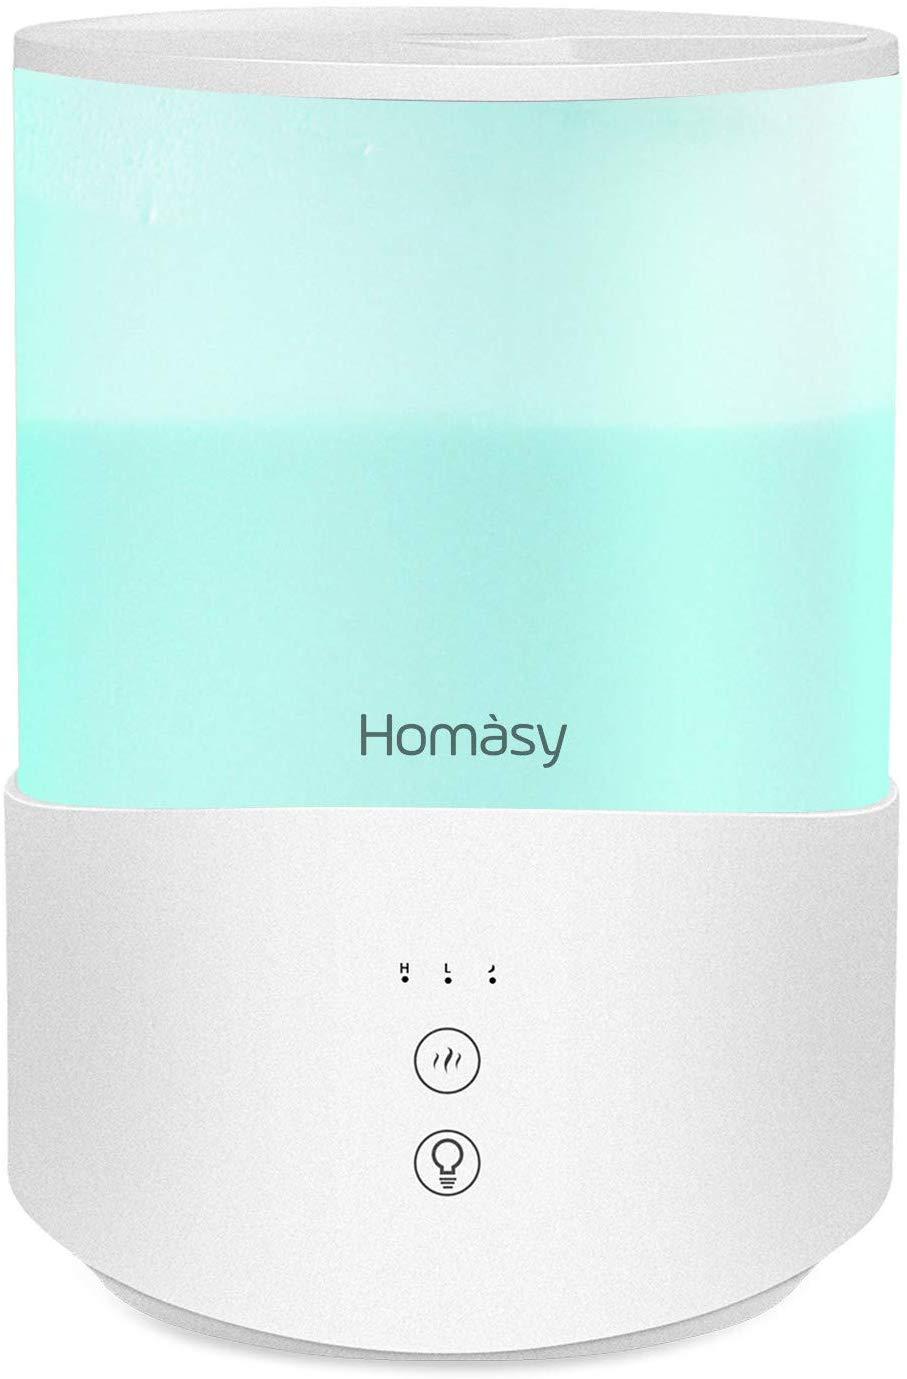 Homasy HM510A